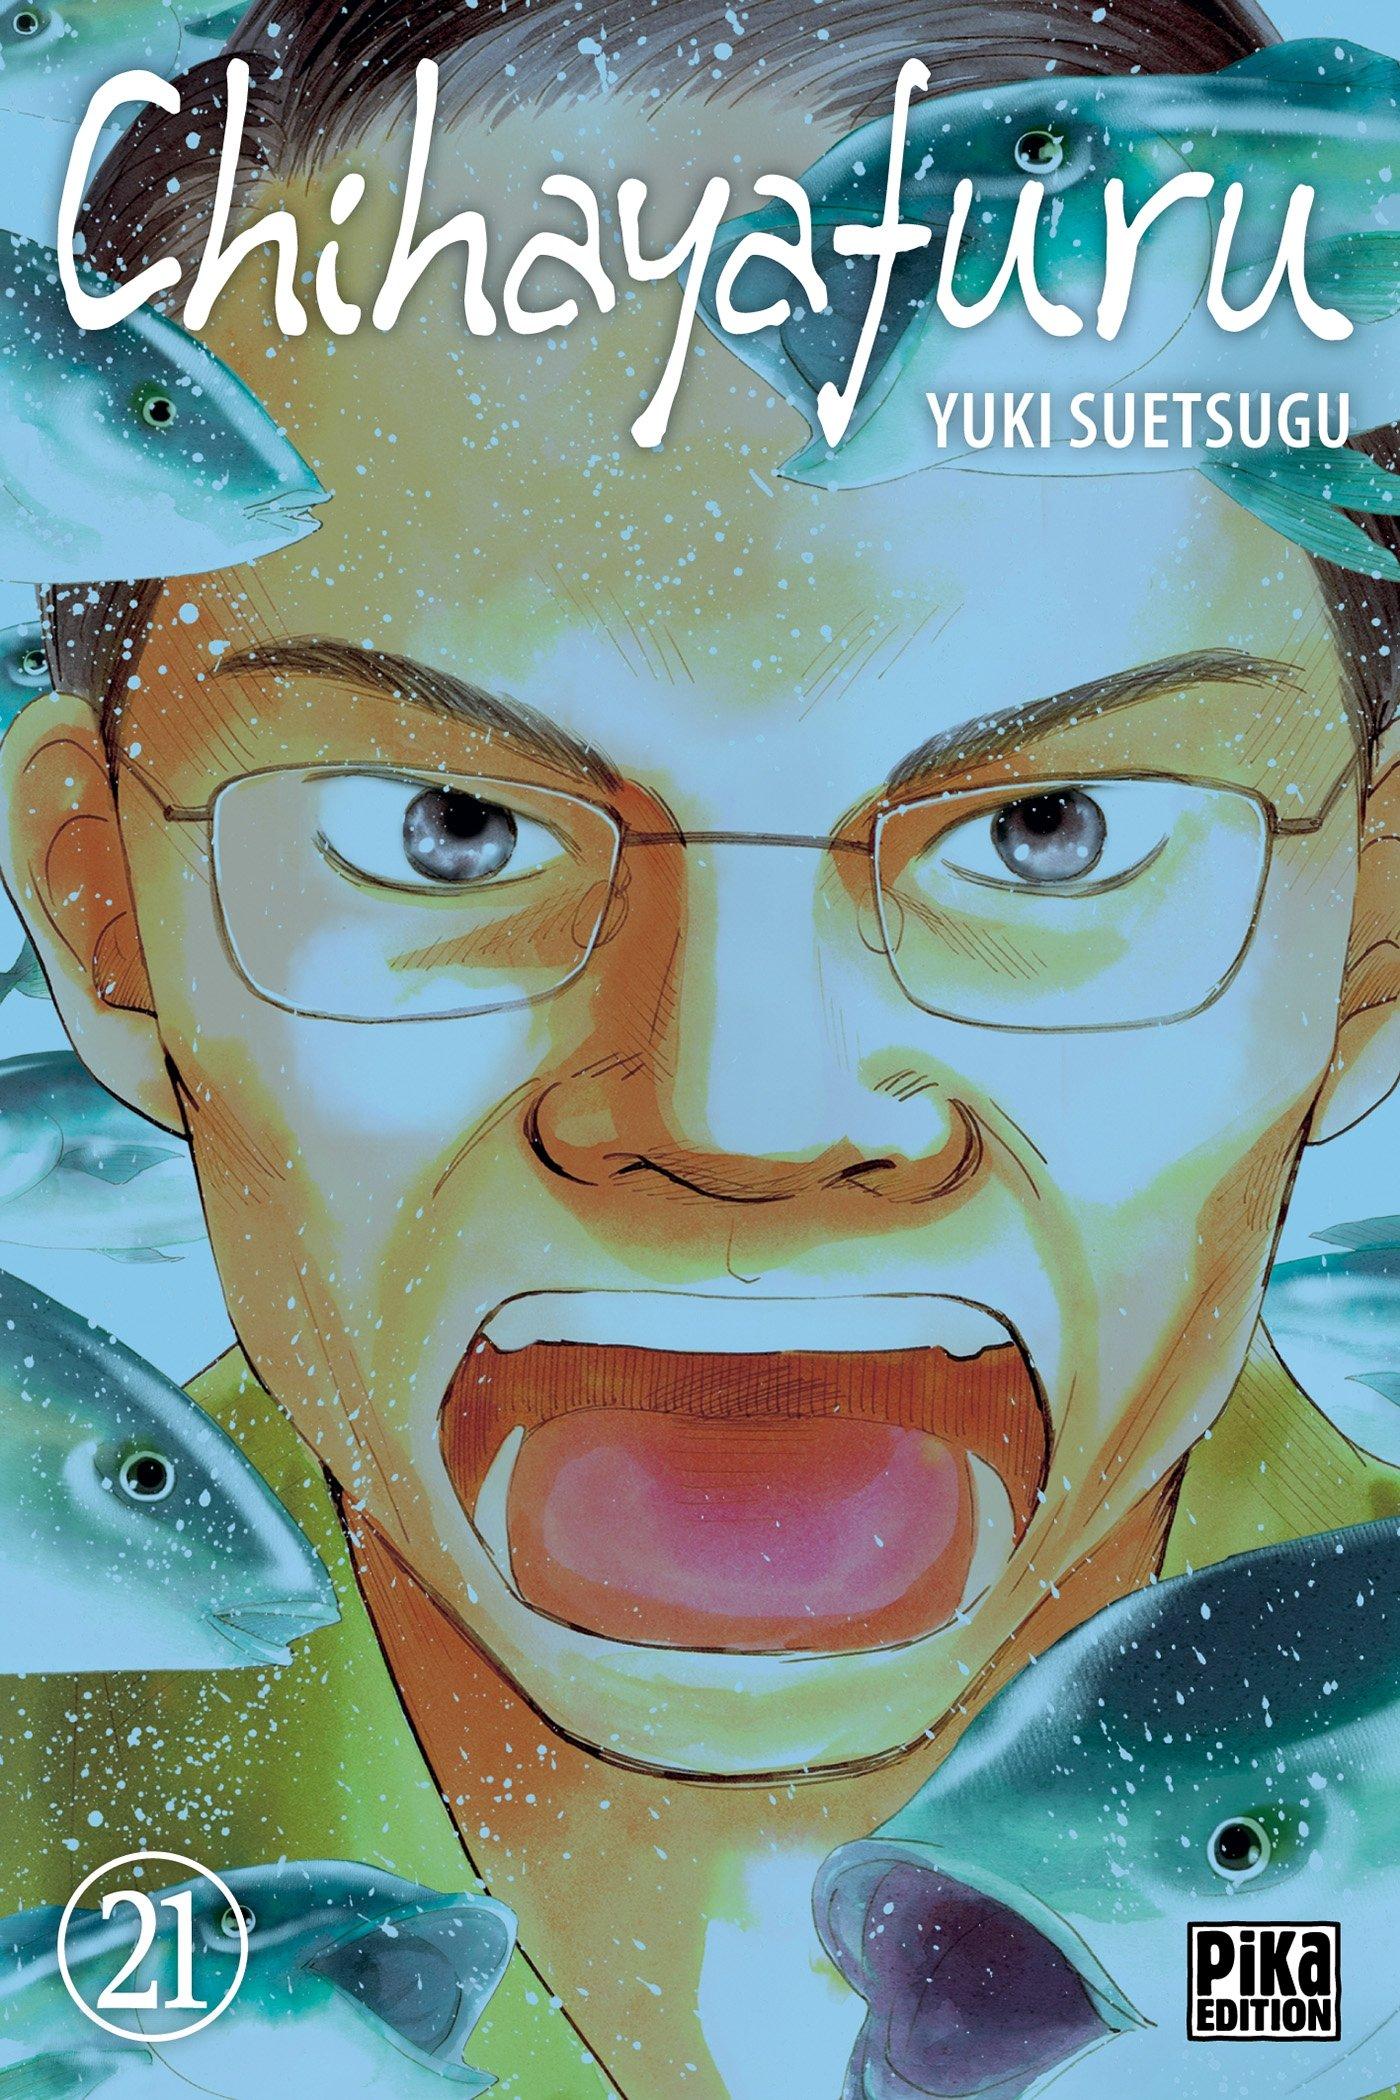 Chihayafuru 21